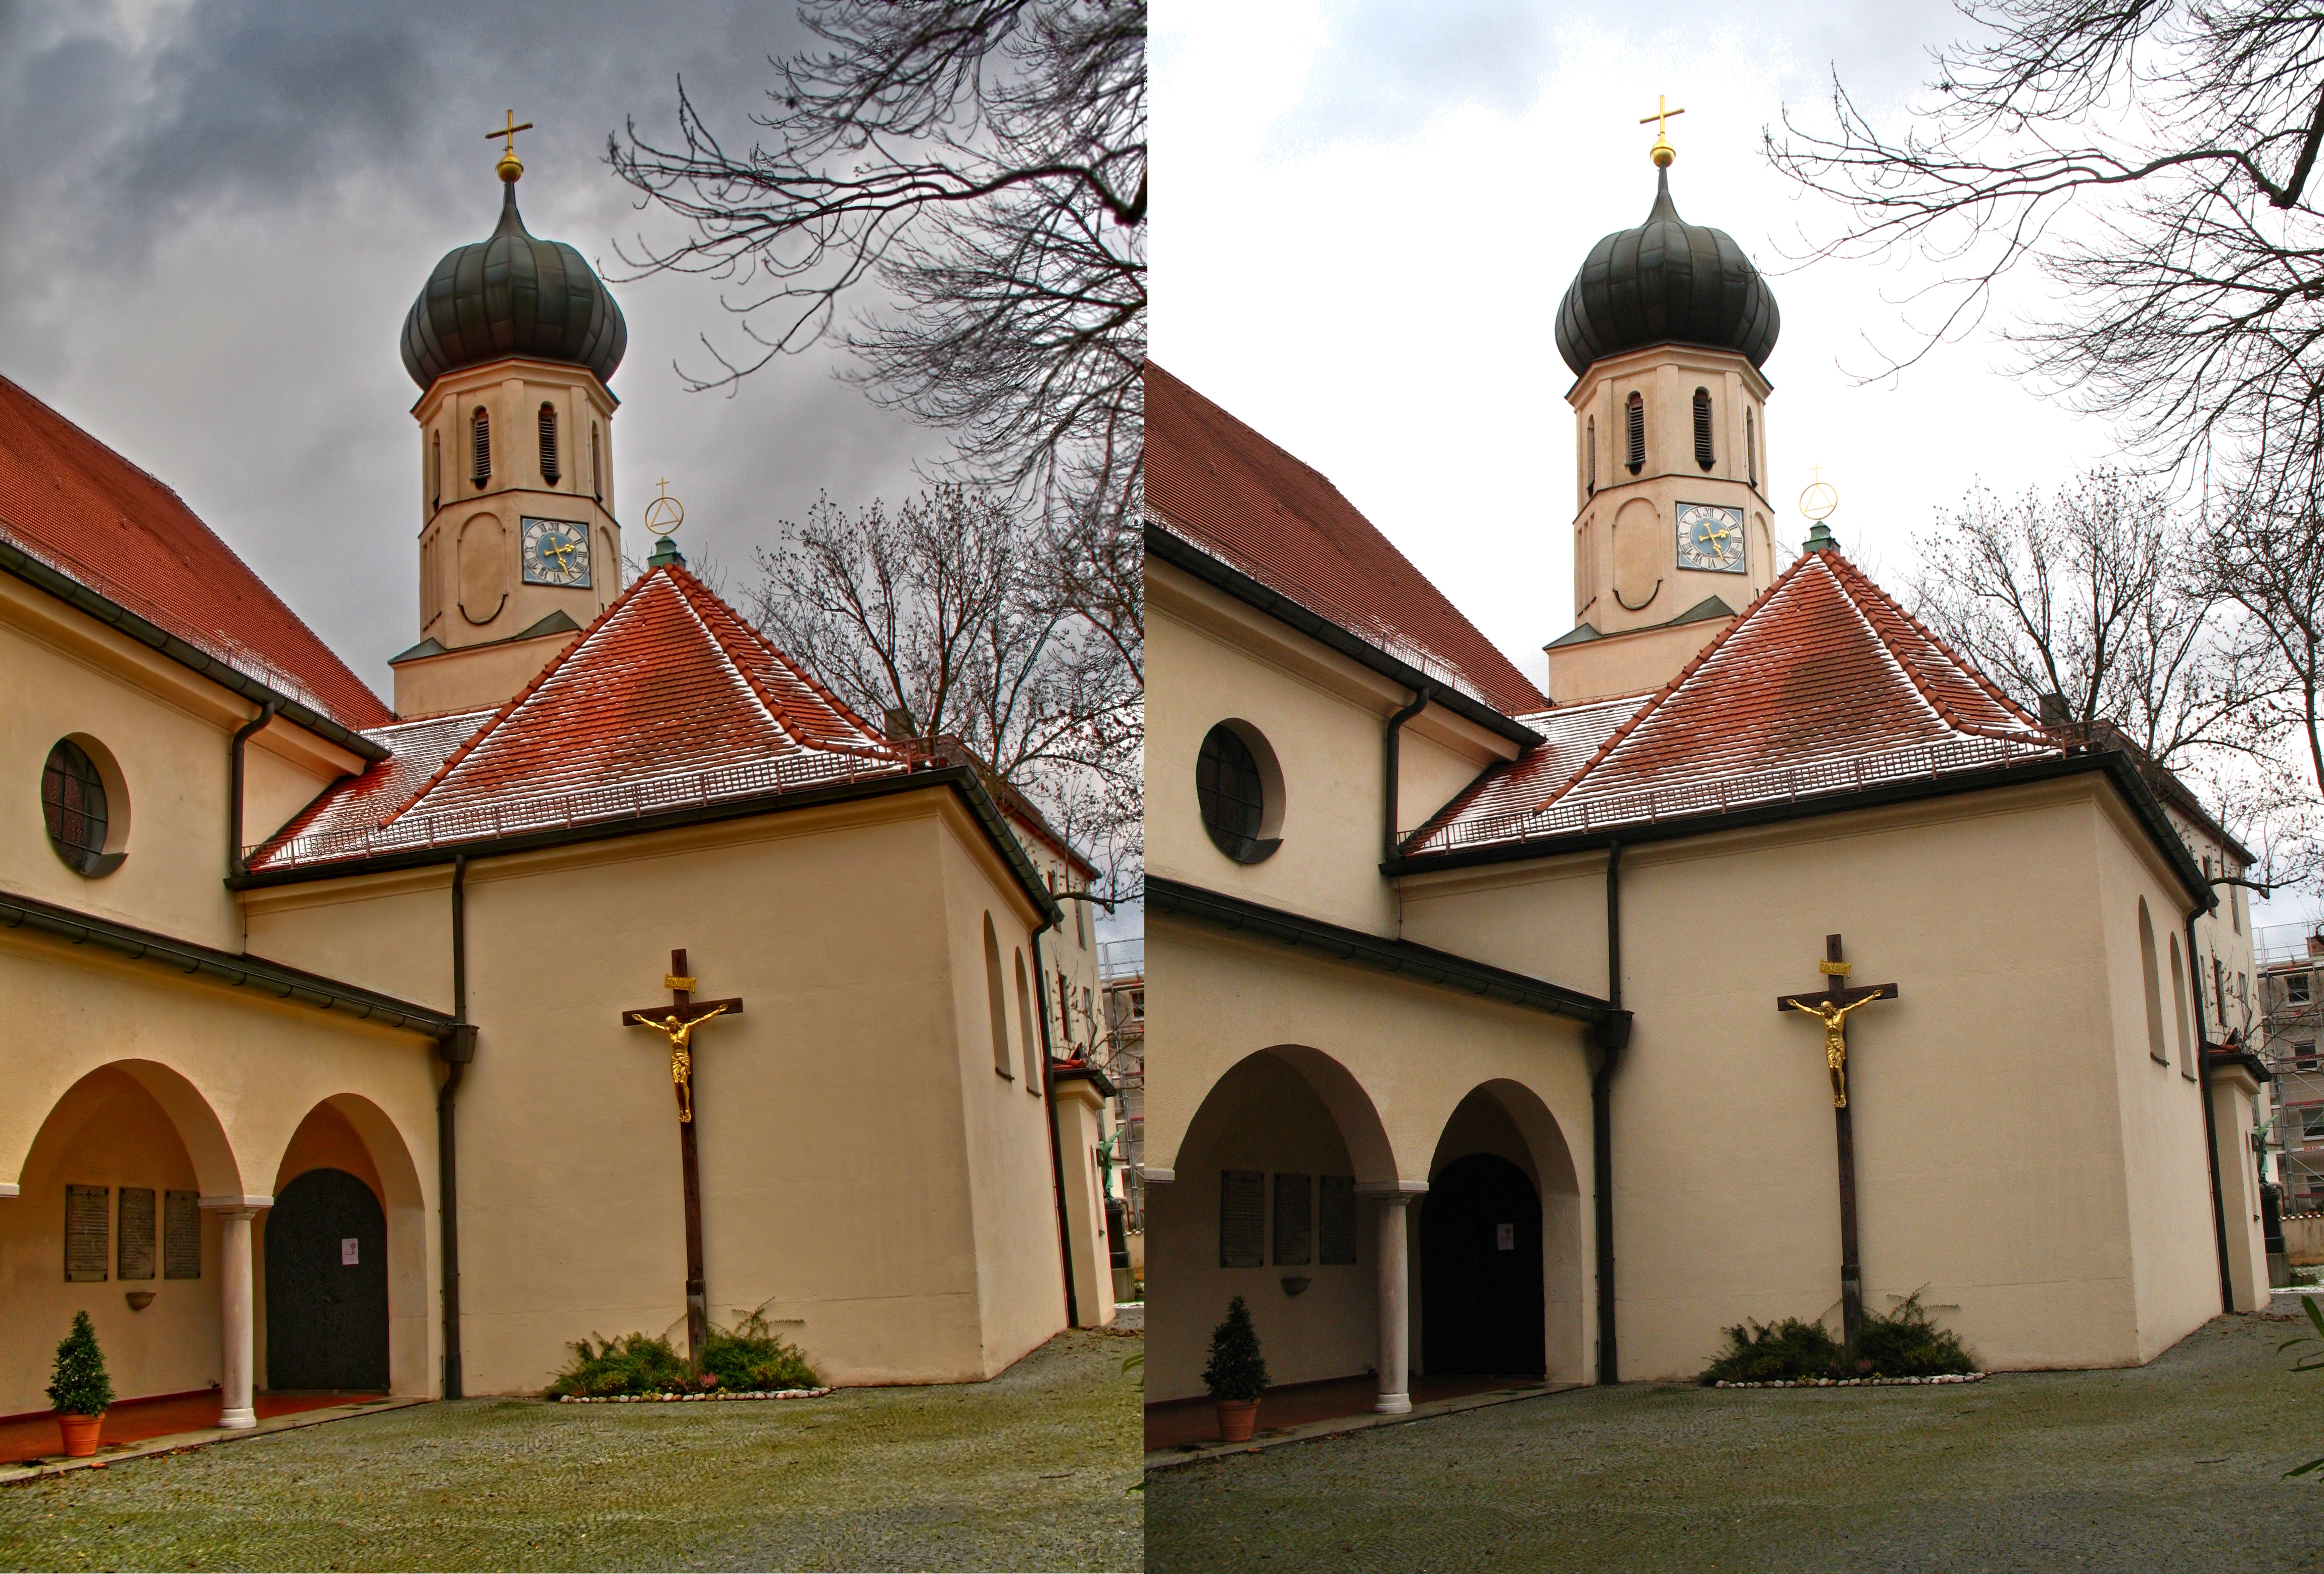 c date vergleich Wuppertal